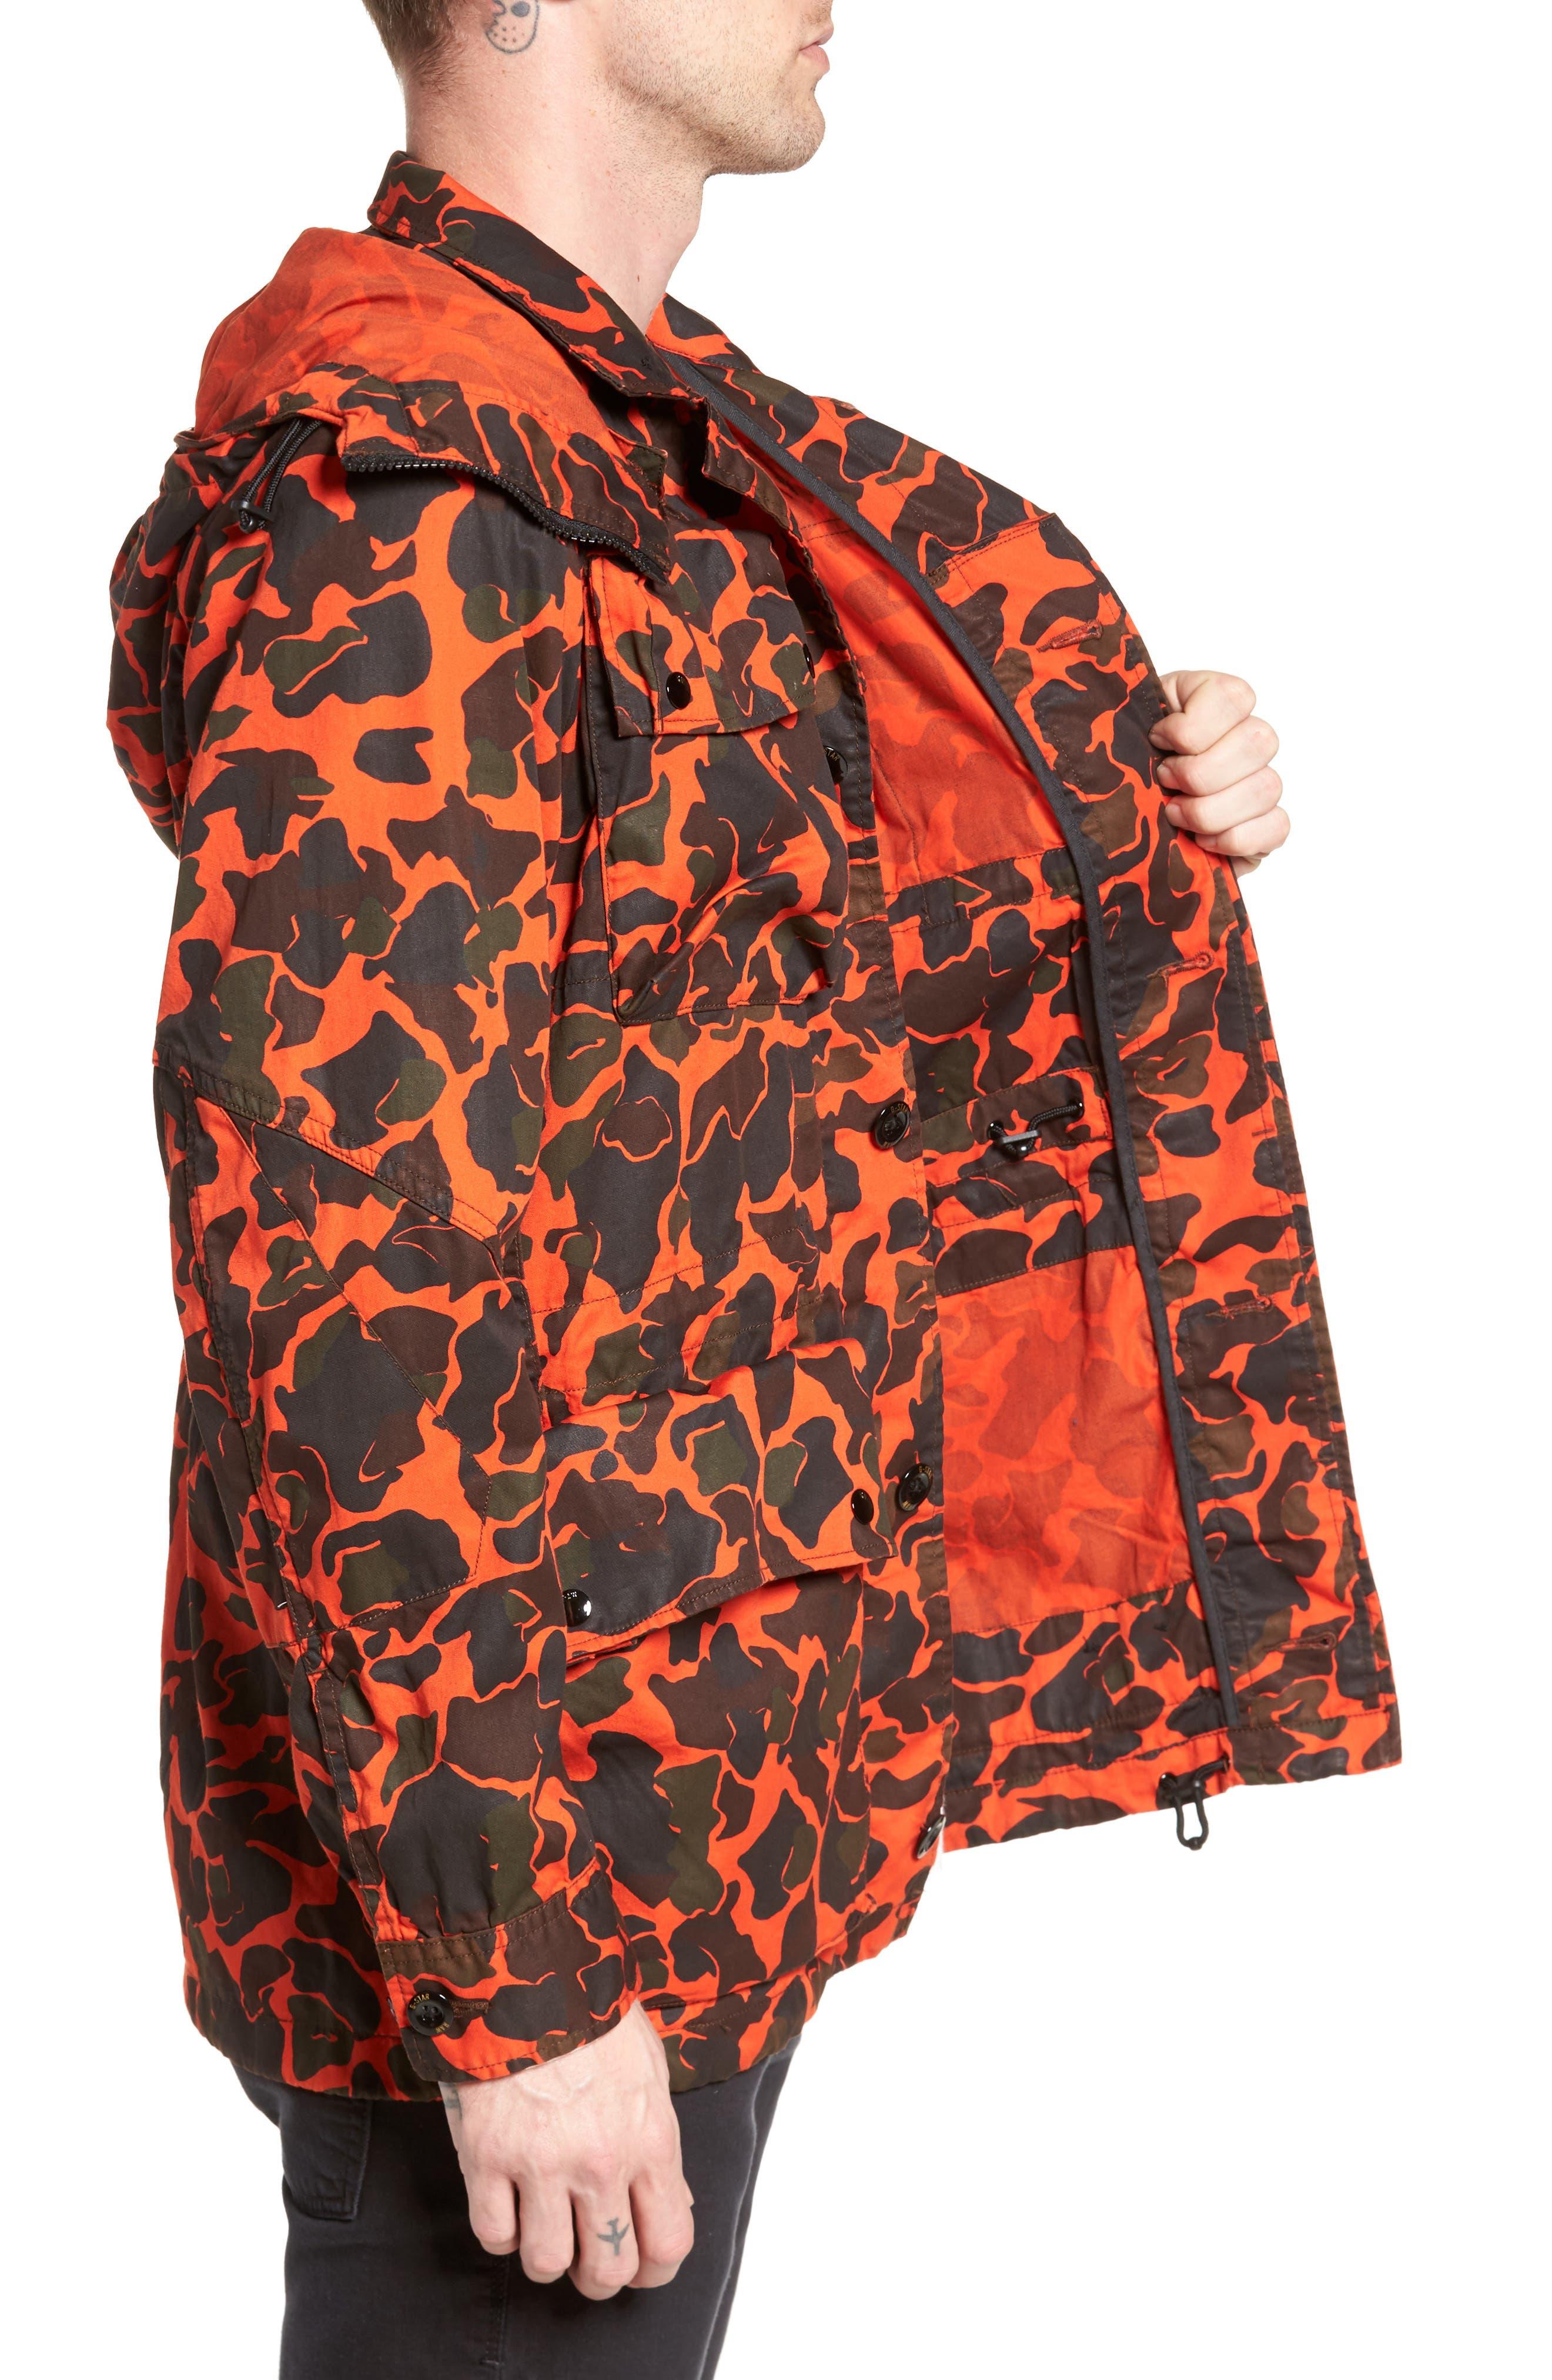 Ospak Submarine Hooded Jacket,                             Alternate thumbnail 3, color,                             800